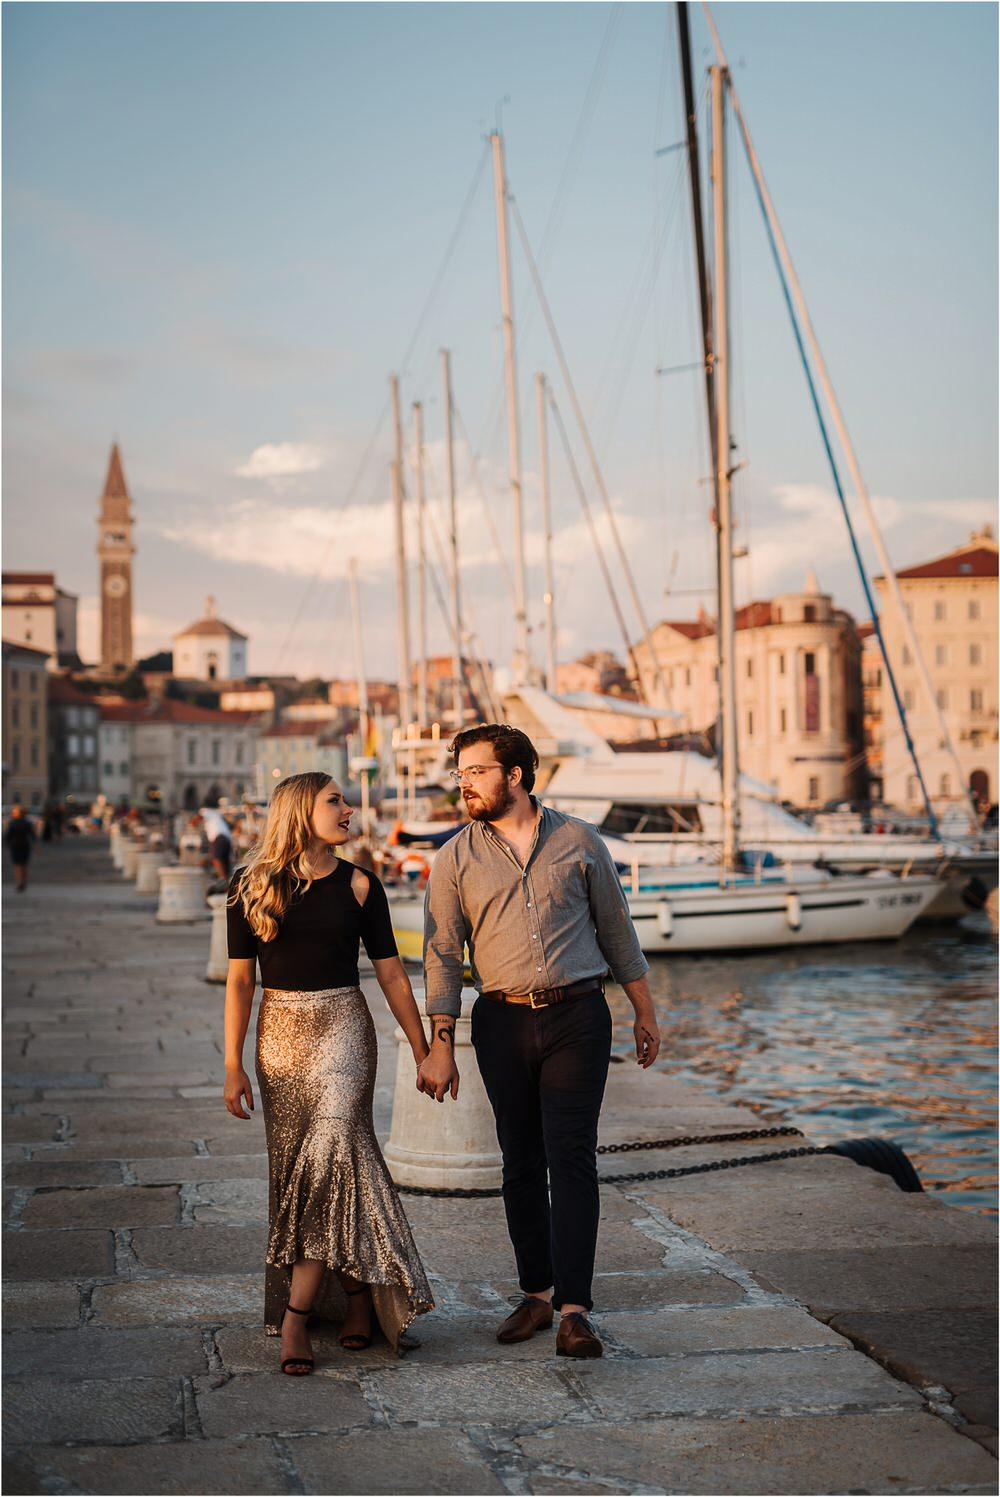 piran wedding photographer engagement anniversary honeymoon photography recommended slovenia seaside photographer  0042.jpg